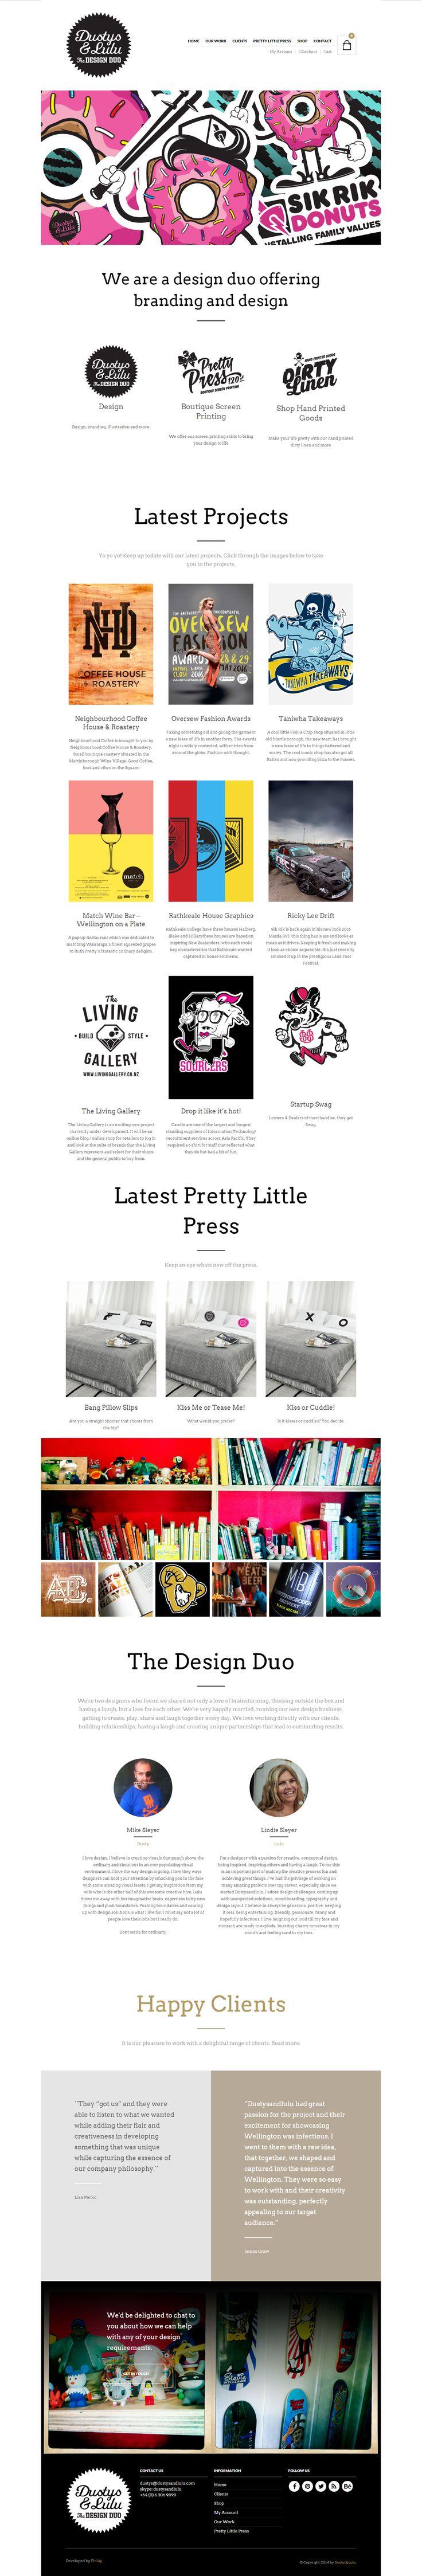 http://dustysandlulu.com/ was built with The Retailer Premium WordPress theme available here: https://themeforest.net/item/the-retailer-responsive-wordpress-theme/4287447?utm_source=pinterest.com&utm_medium=social&utm_content=dusty-lulu&utm_campaign=showcase #graphicdesign #web #webdesign #wordpresstheme